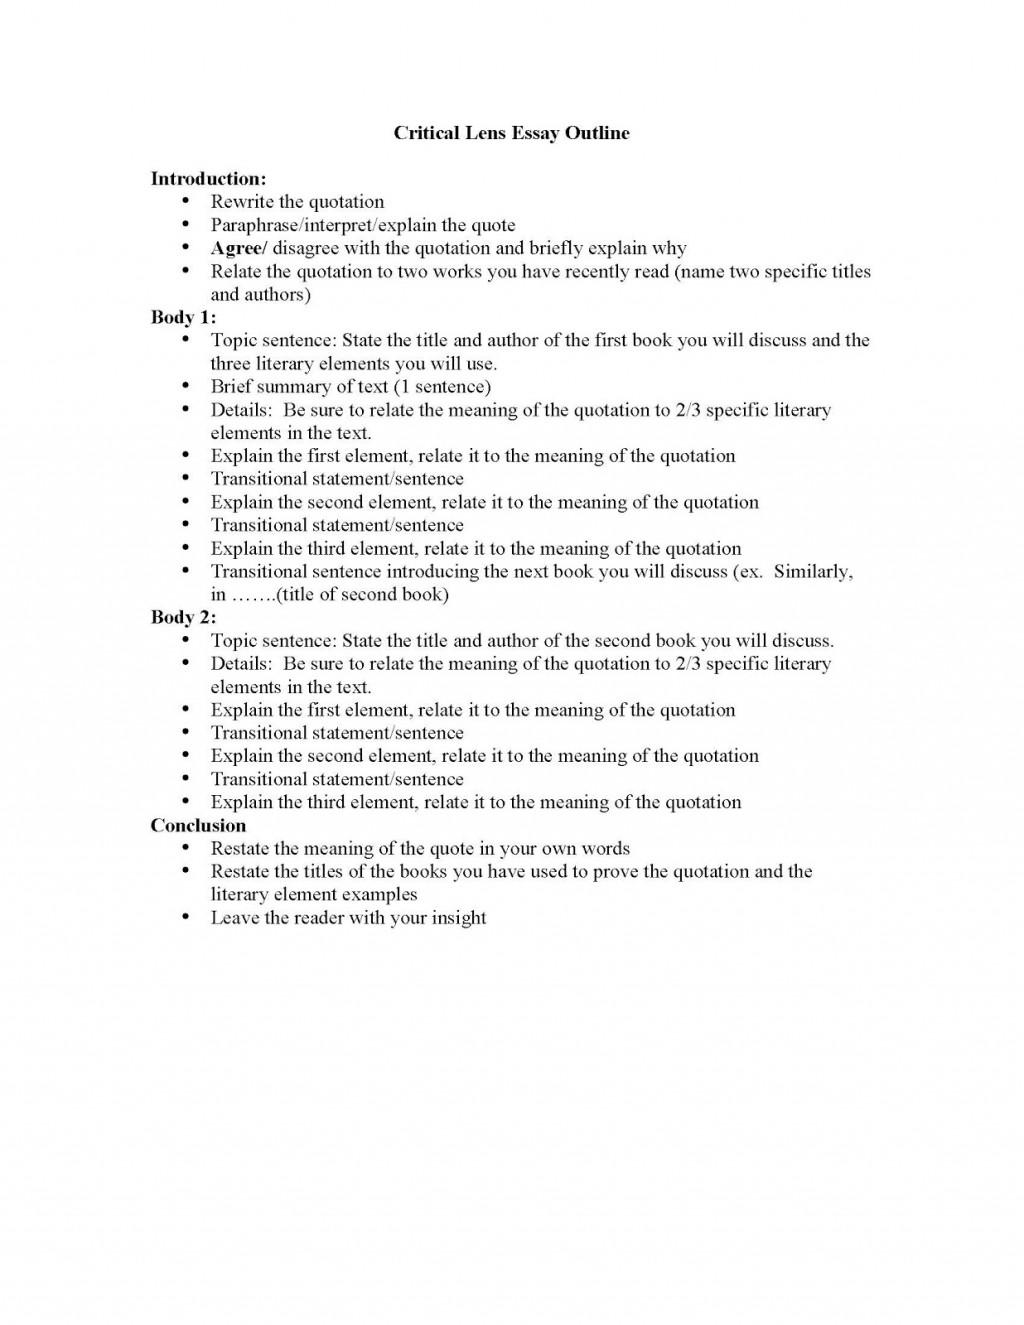 001 Essay Example Outline Of An Criticallensessayoutlineandliterayelements Page 1 Sensational Argumentative Sample Co Education Pdf Large